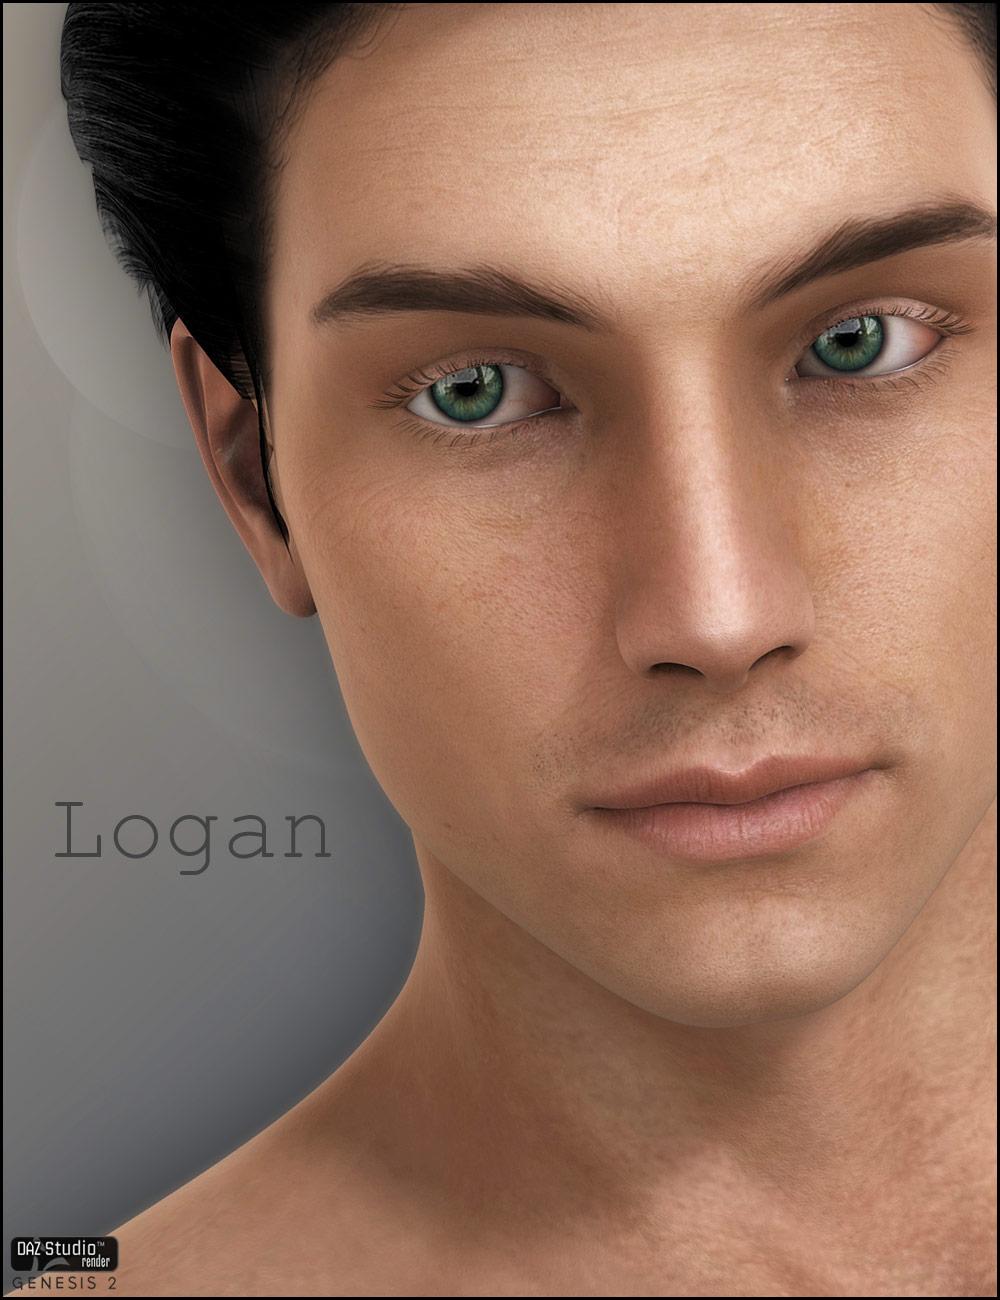 Logan by: CountessJessaii, 3D Models by Daz 3D